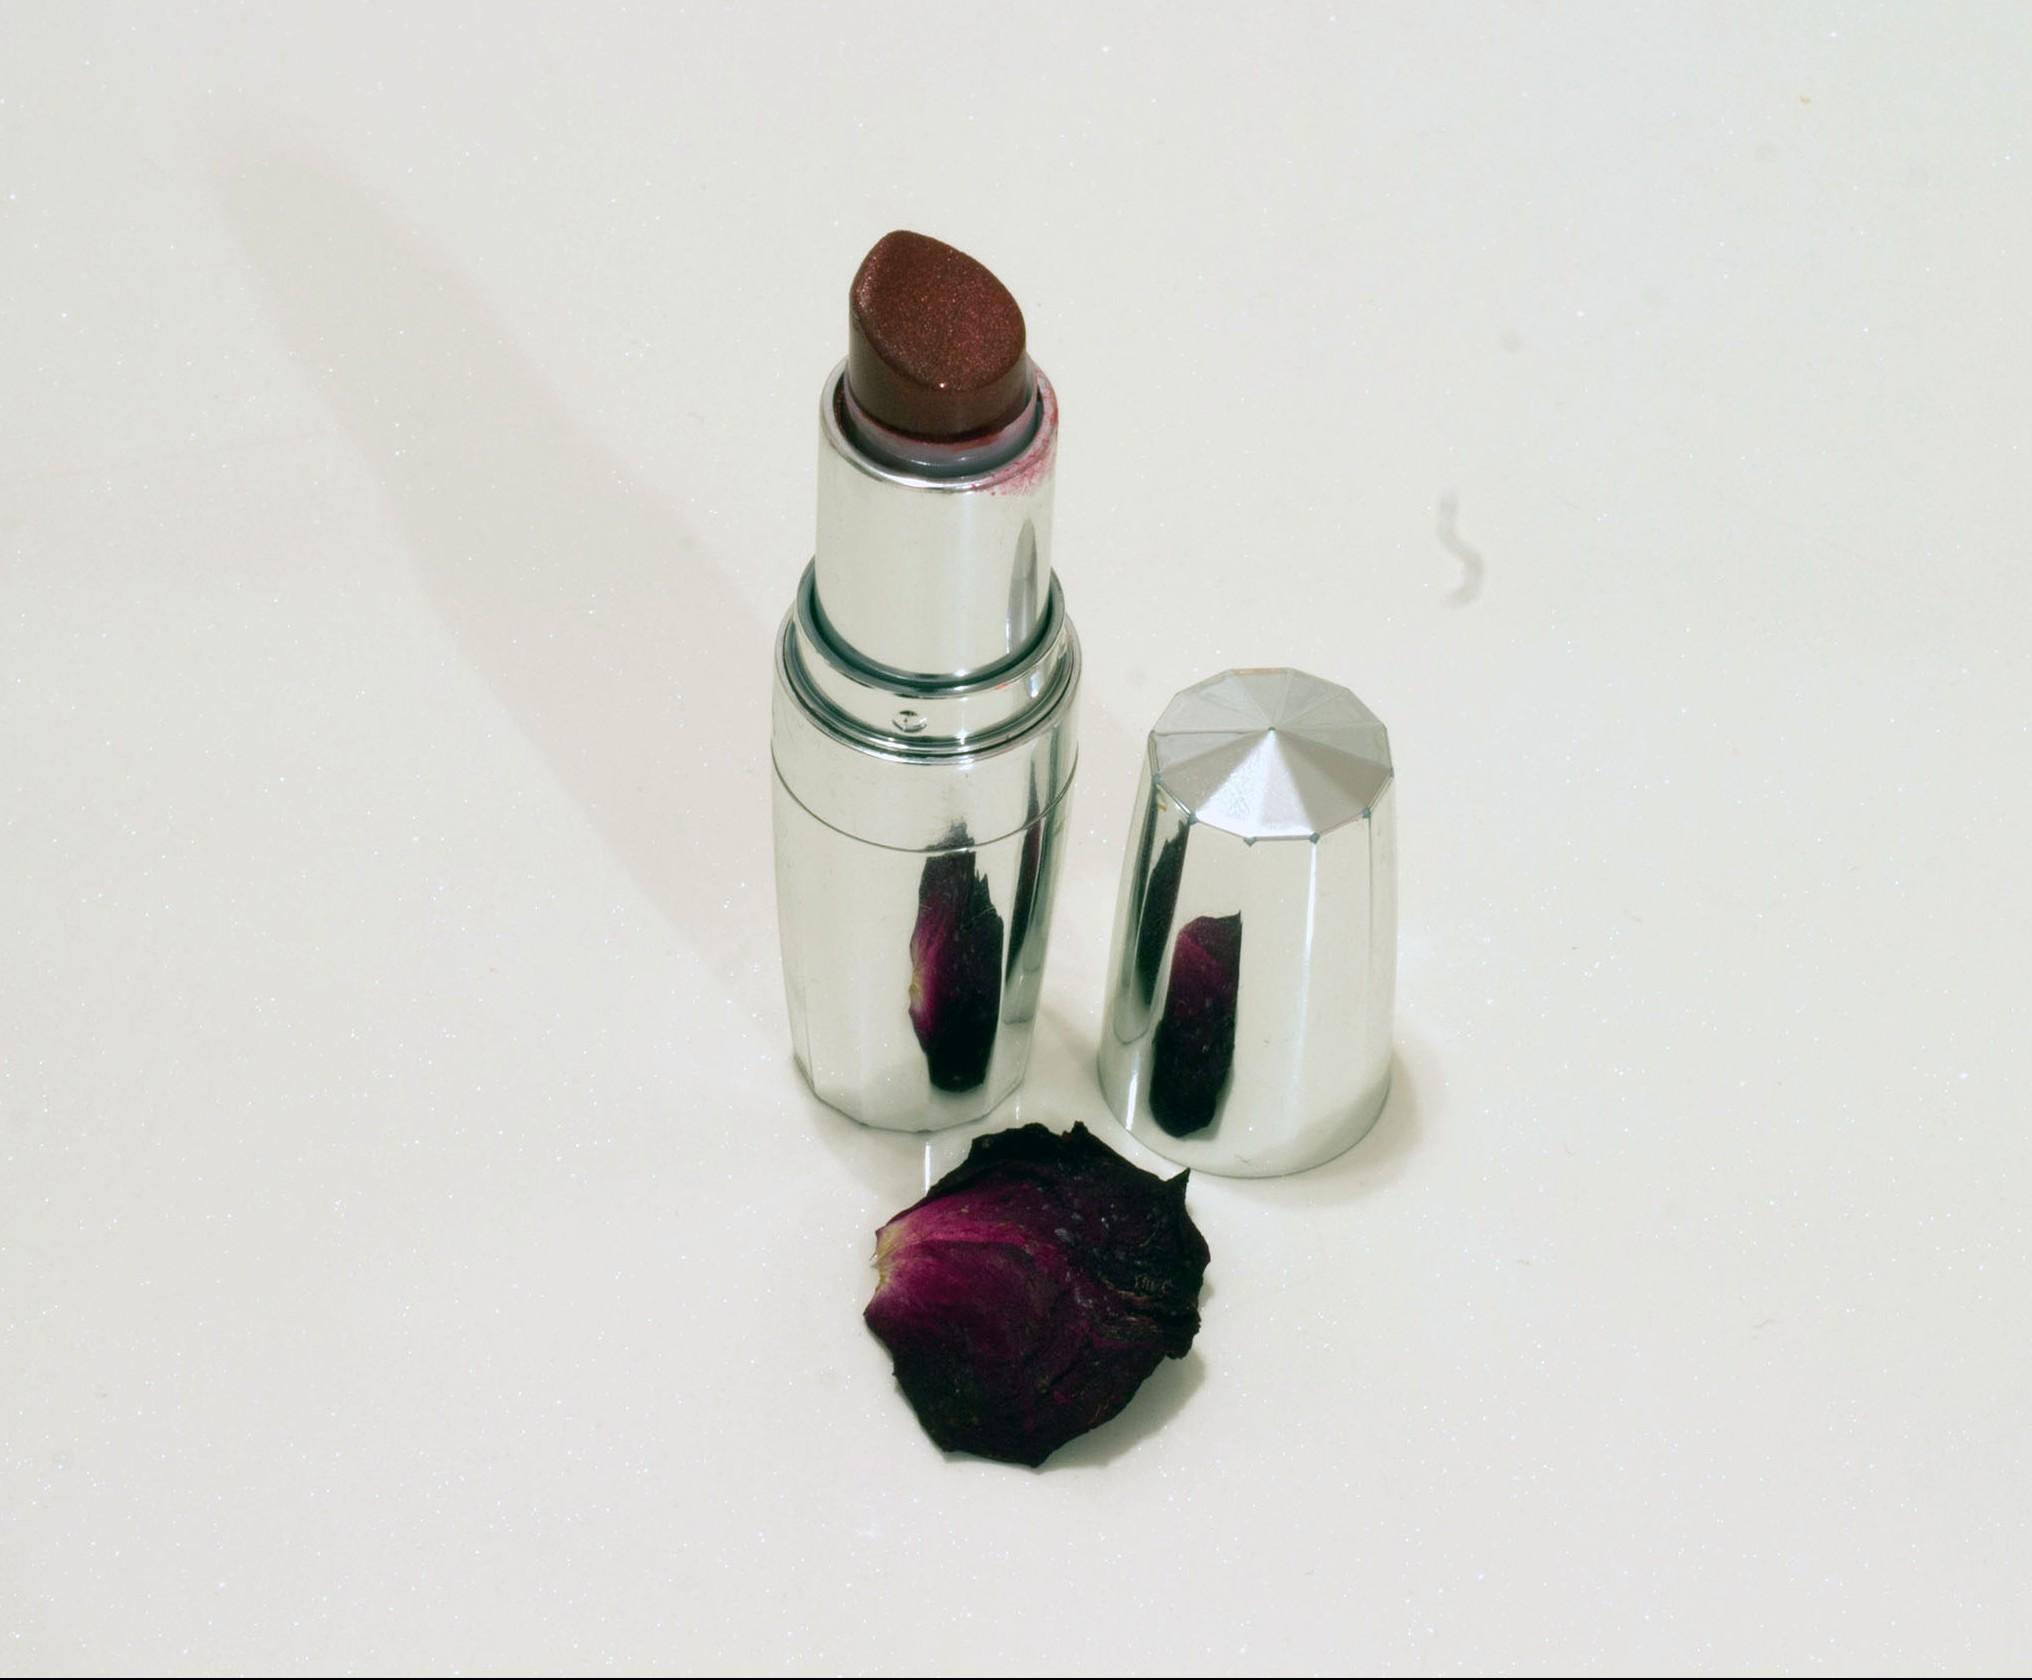 Avon Perfect Kiss Ruj Coy Copper